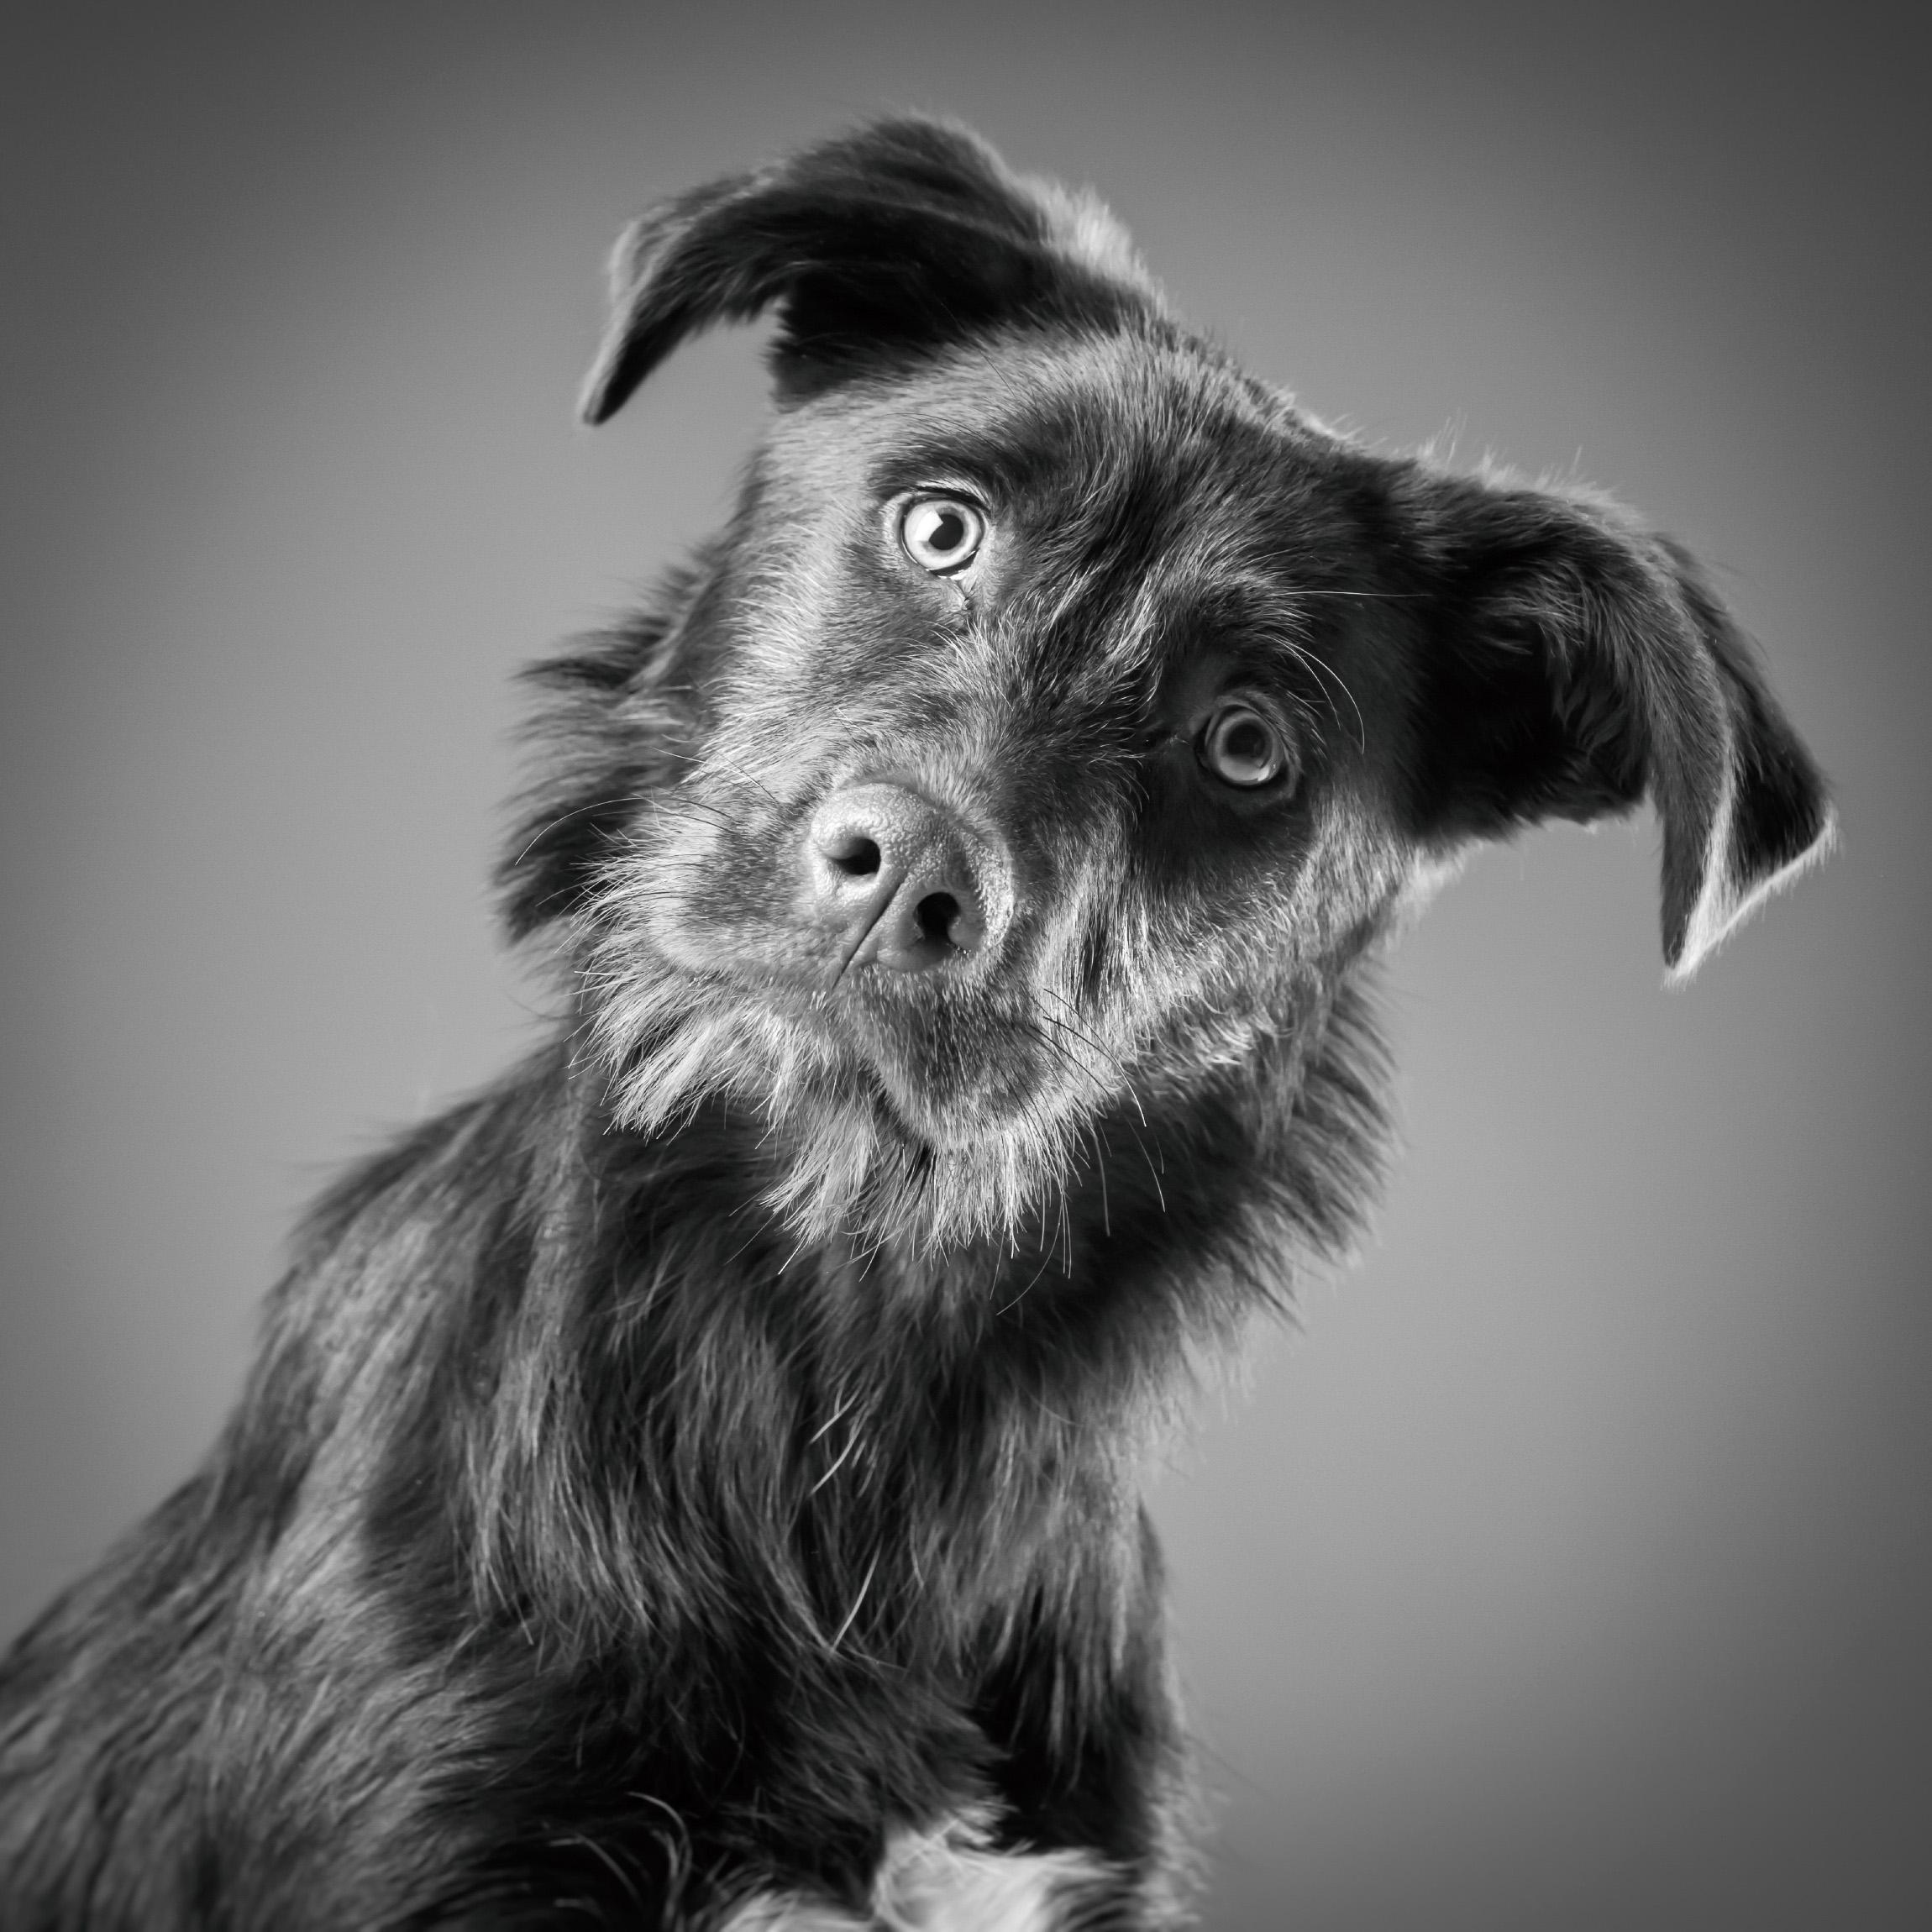 06 foto-gossos-celine-pech-andorra-0149